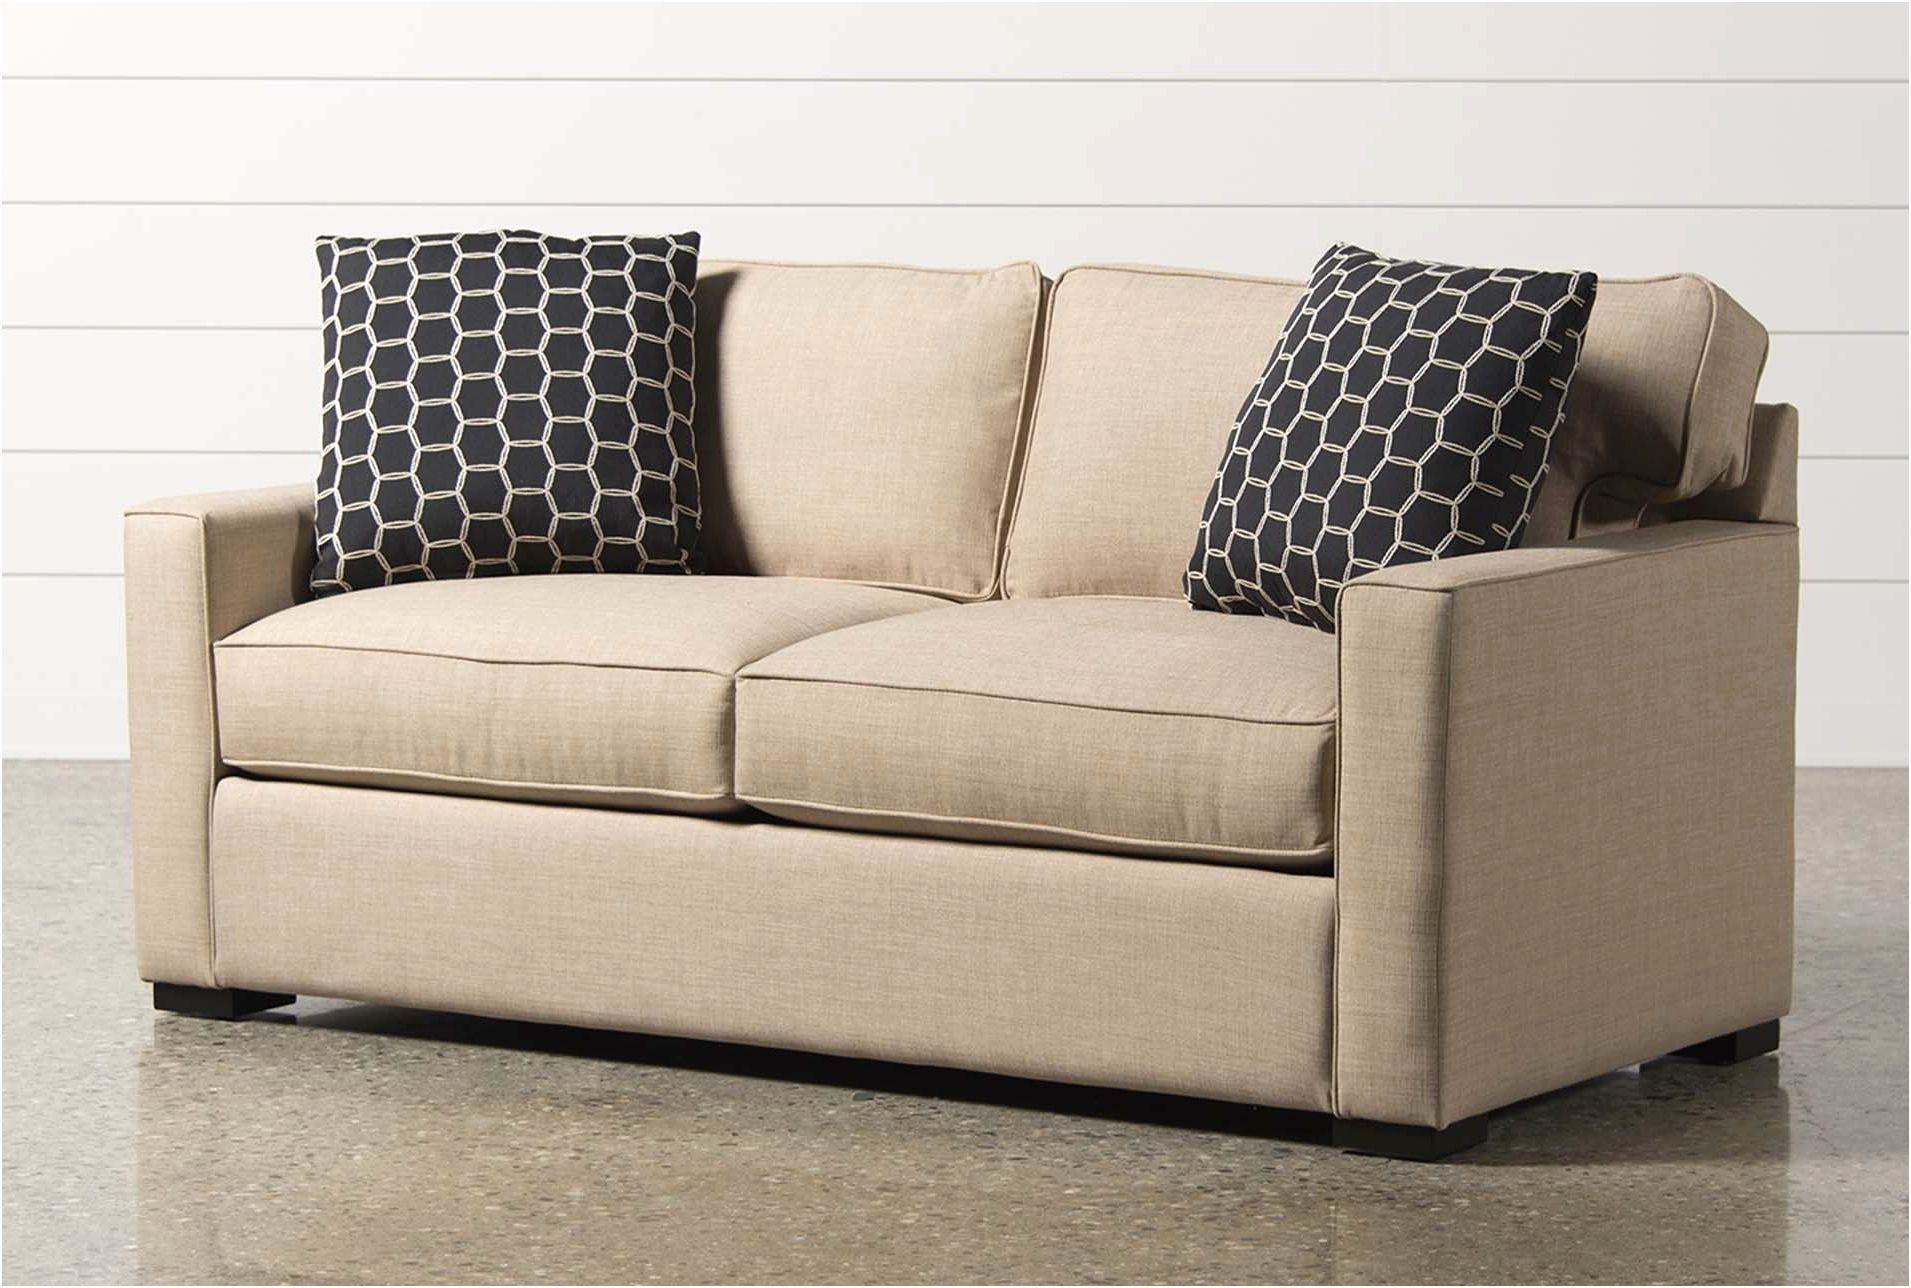 New Loveseat Sleeper Sofa Ikea Shot Sofa Full Size Sleeper Sofa Bedroom Couches  Loveseats Twin Check